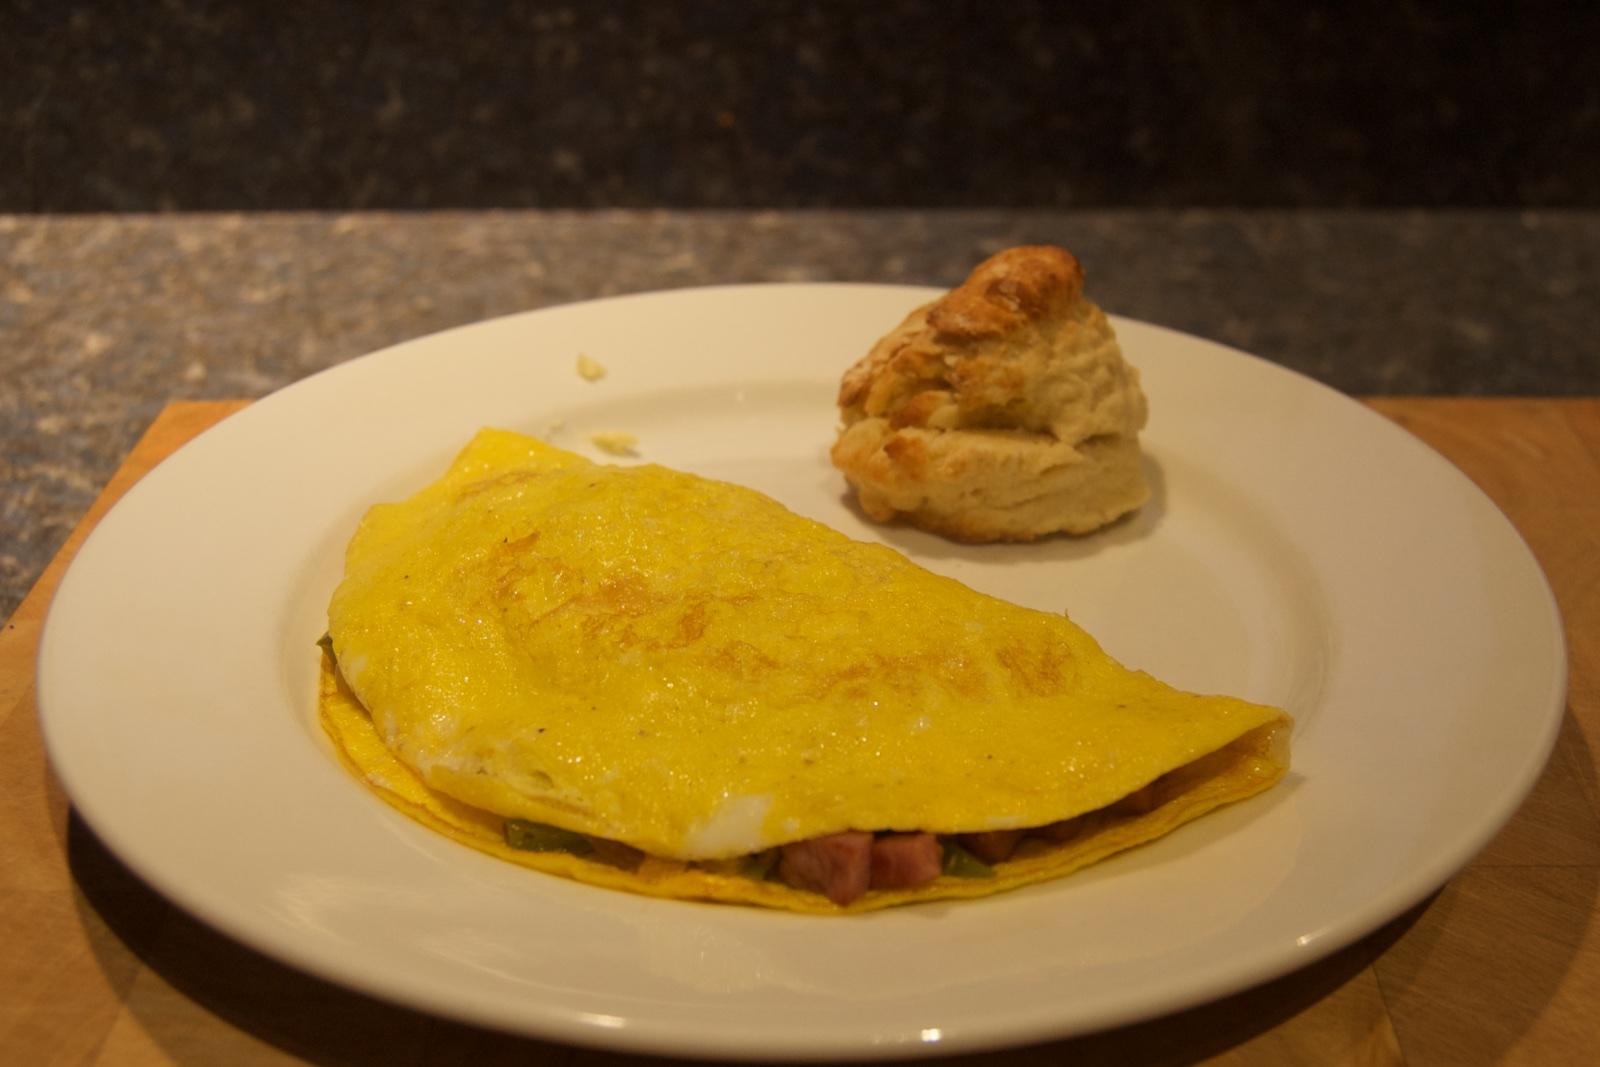 http://blog.rickk.com/food/2017/05/23/ate.2017.05.23.b.jpg